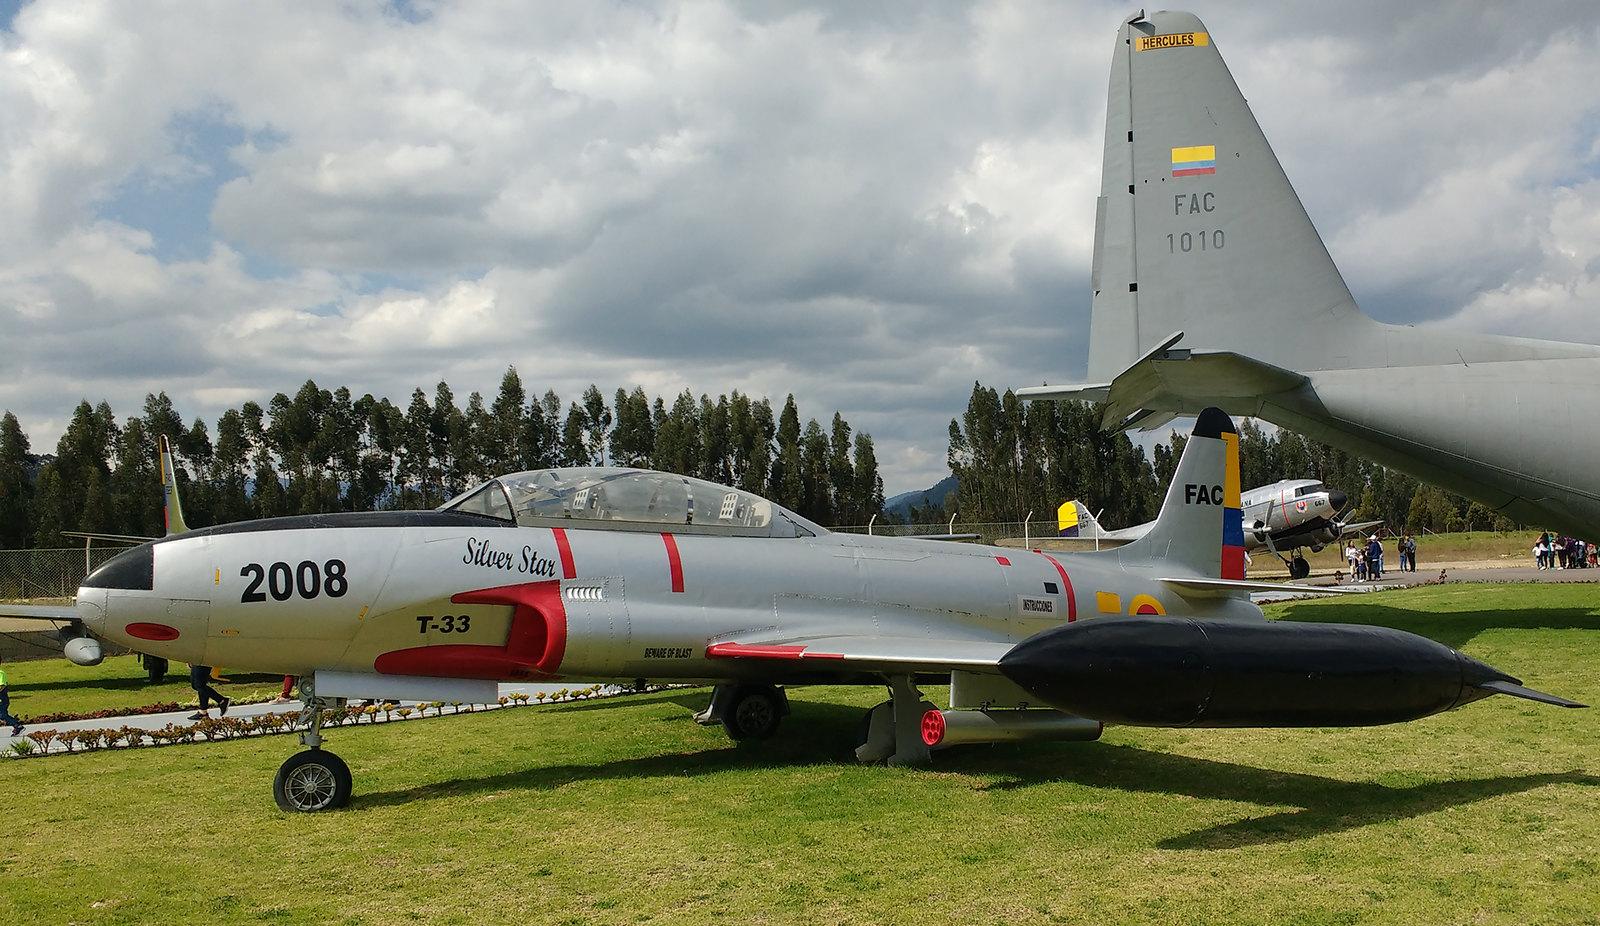 19. Silver-Star-T-33